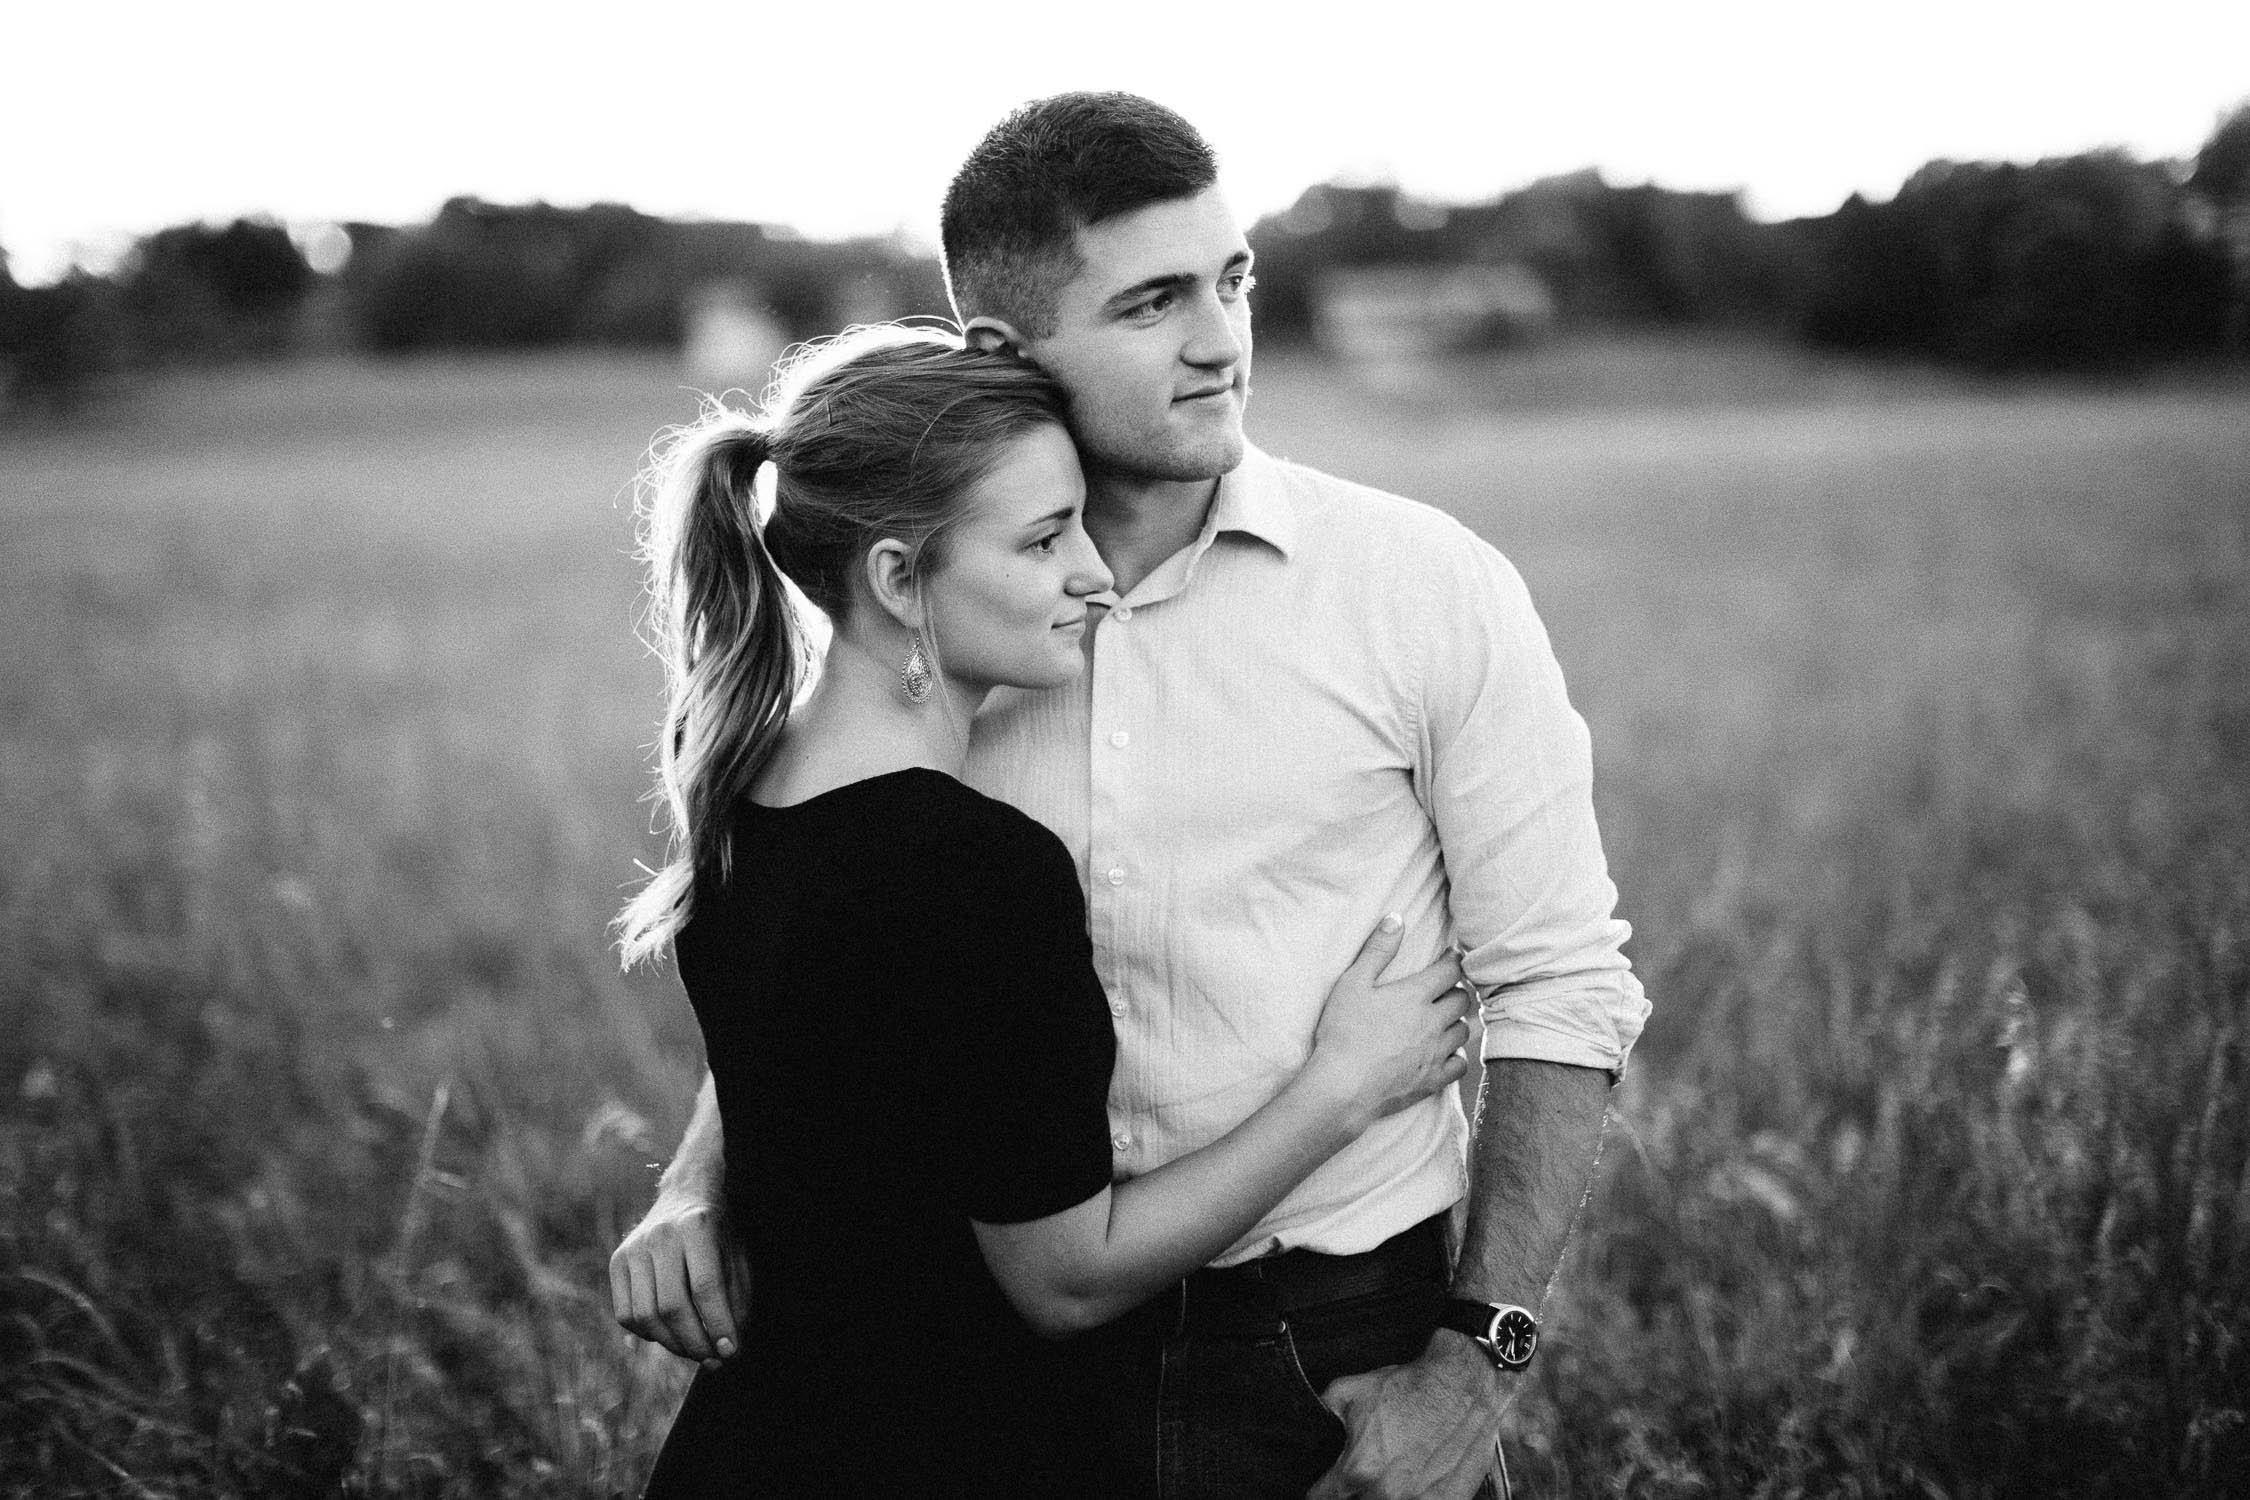 Romantic_Timeless_Downtown_SiouxFalls_Engagement_Wedding_Photographer_60.jpg